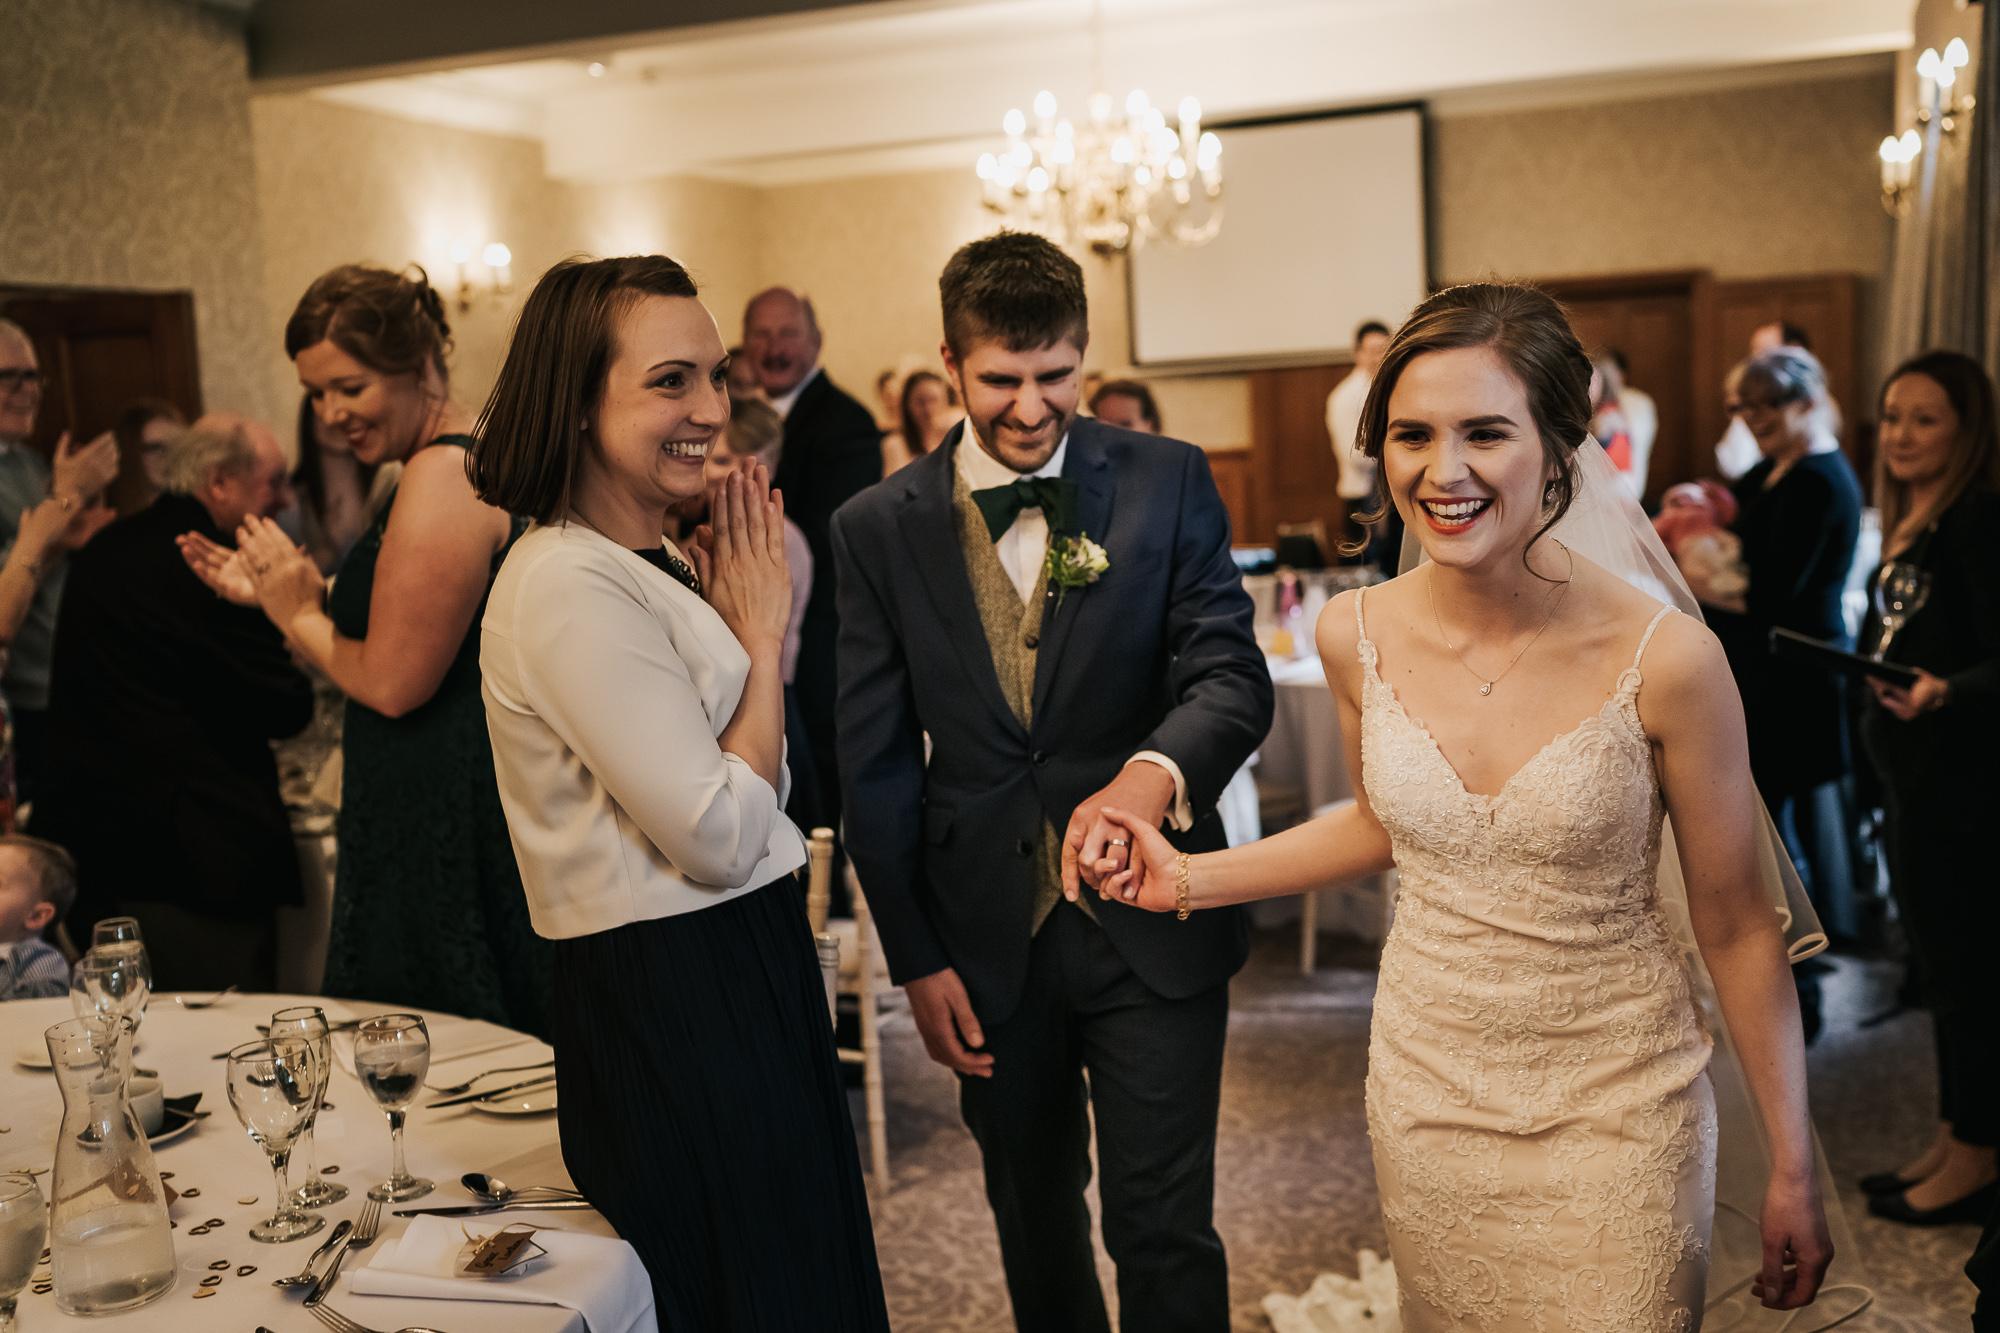 Nunsmere Hall Hotel Wedding photograhpy in cheshire wedding photographer (31 of 42).jpg